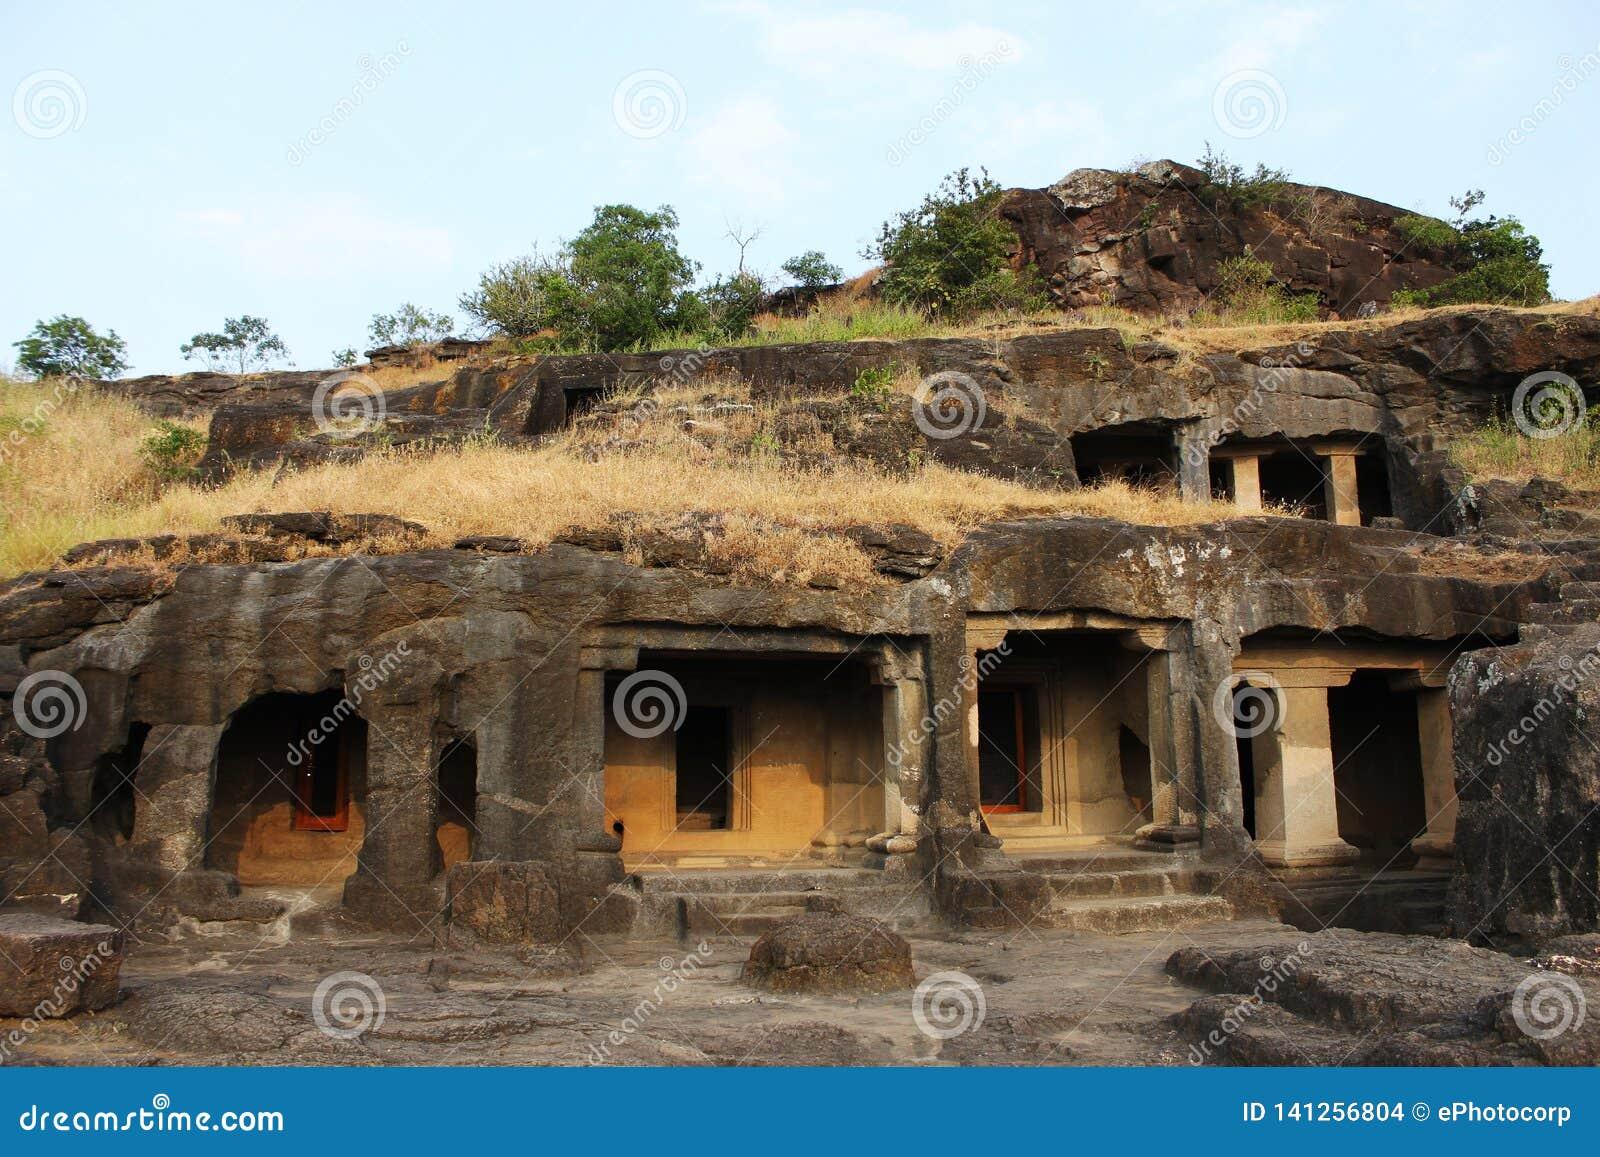 Cave 24, group of five caves, Ellora caves, Aurangabad, Maharashtra